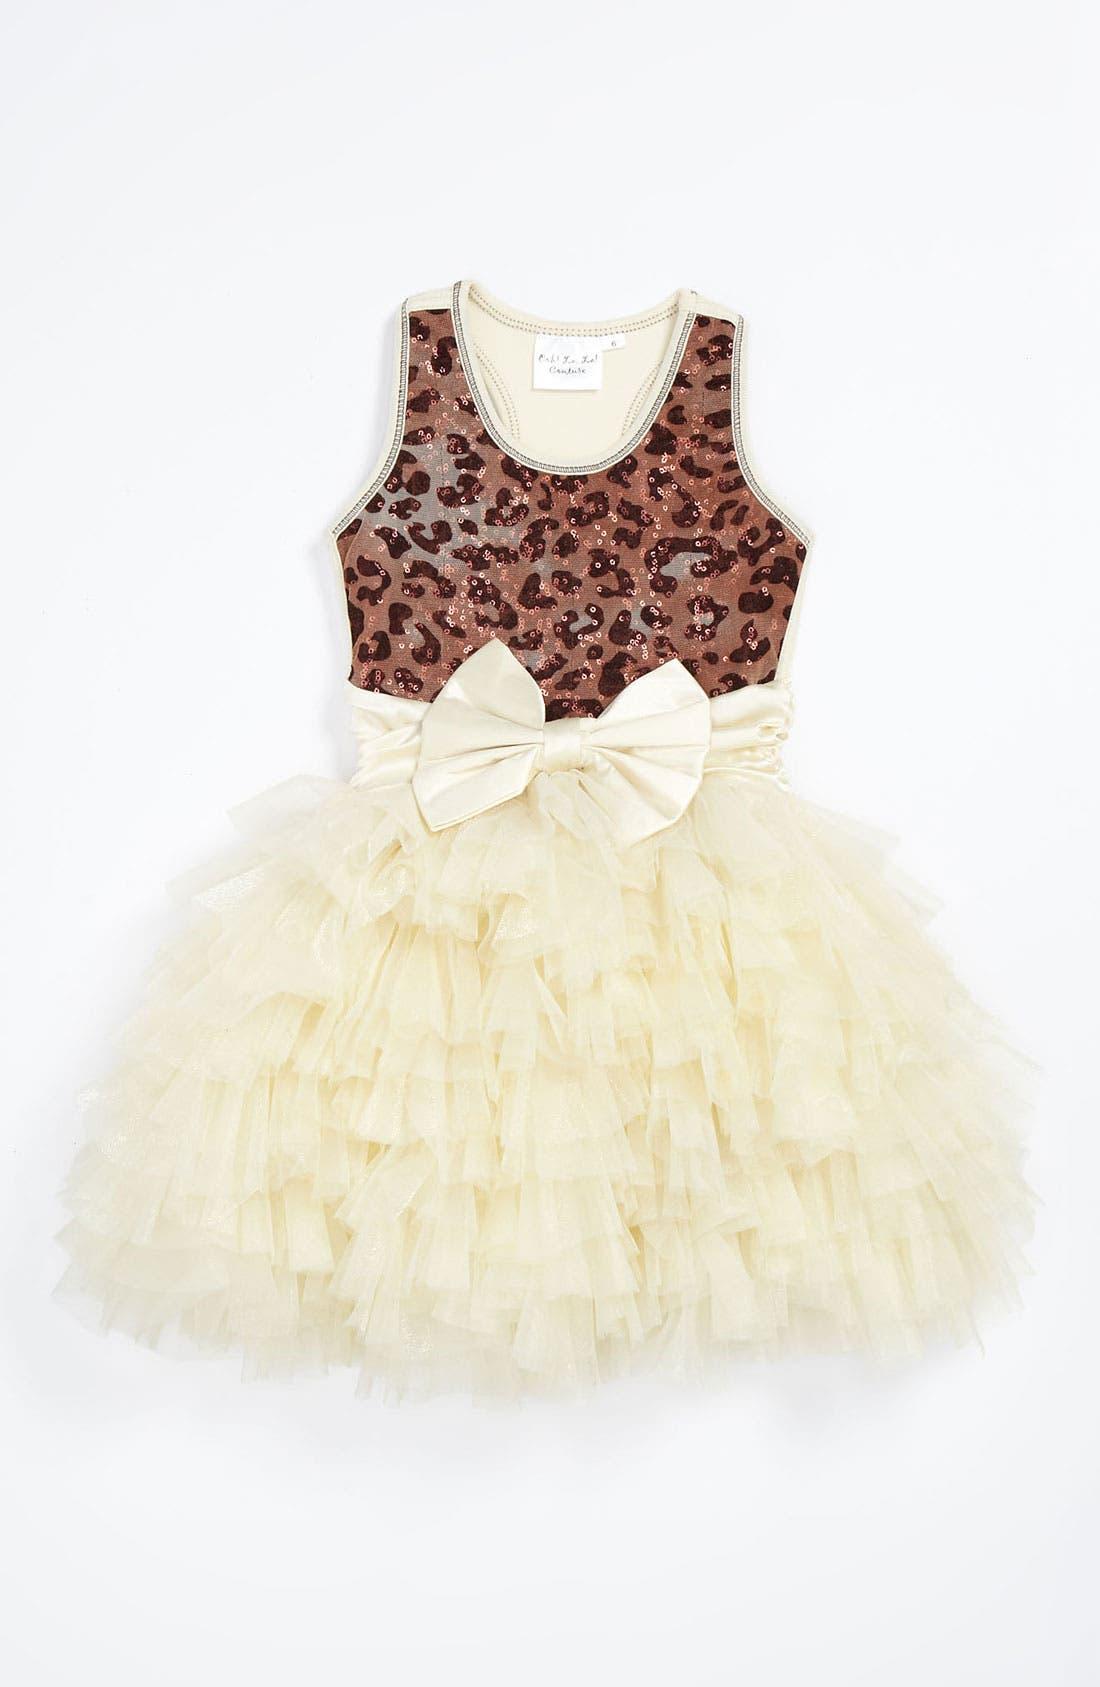 Main Image - Ooh! La, La! Couture 'Dream' Leopard Bodice Dress (Little Girls)